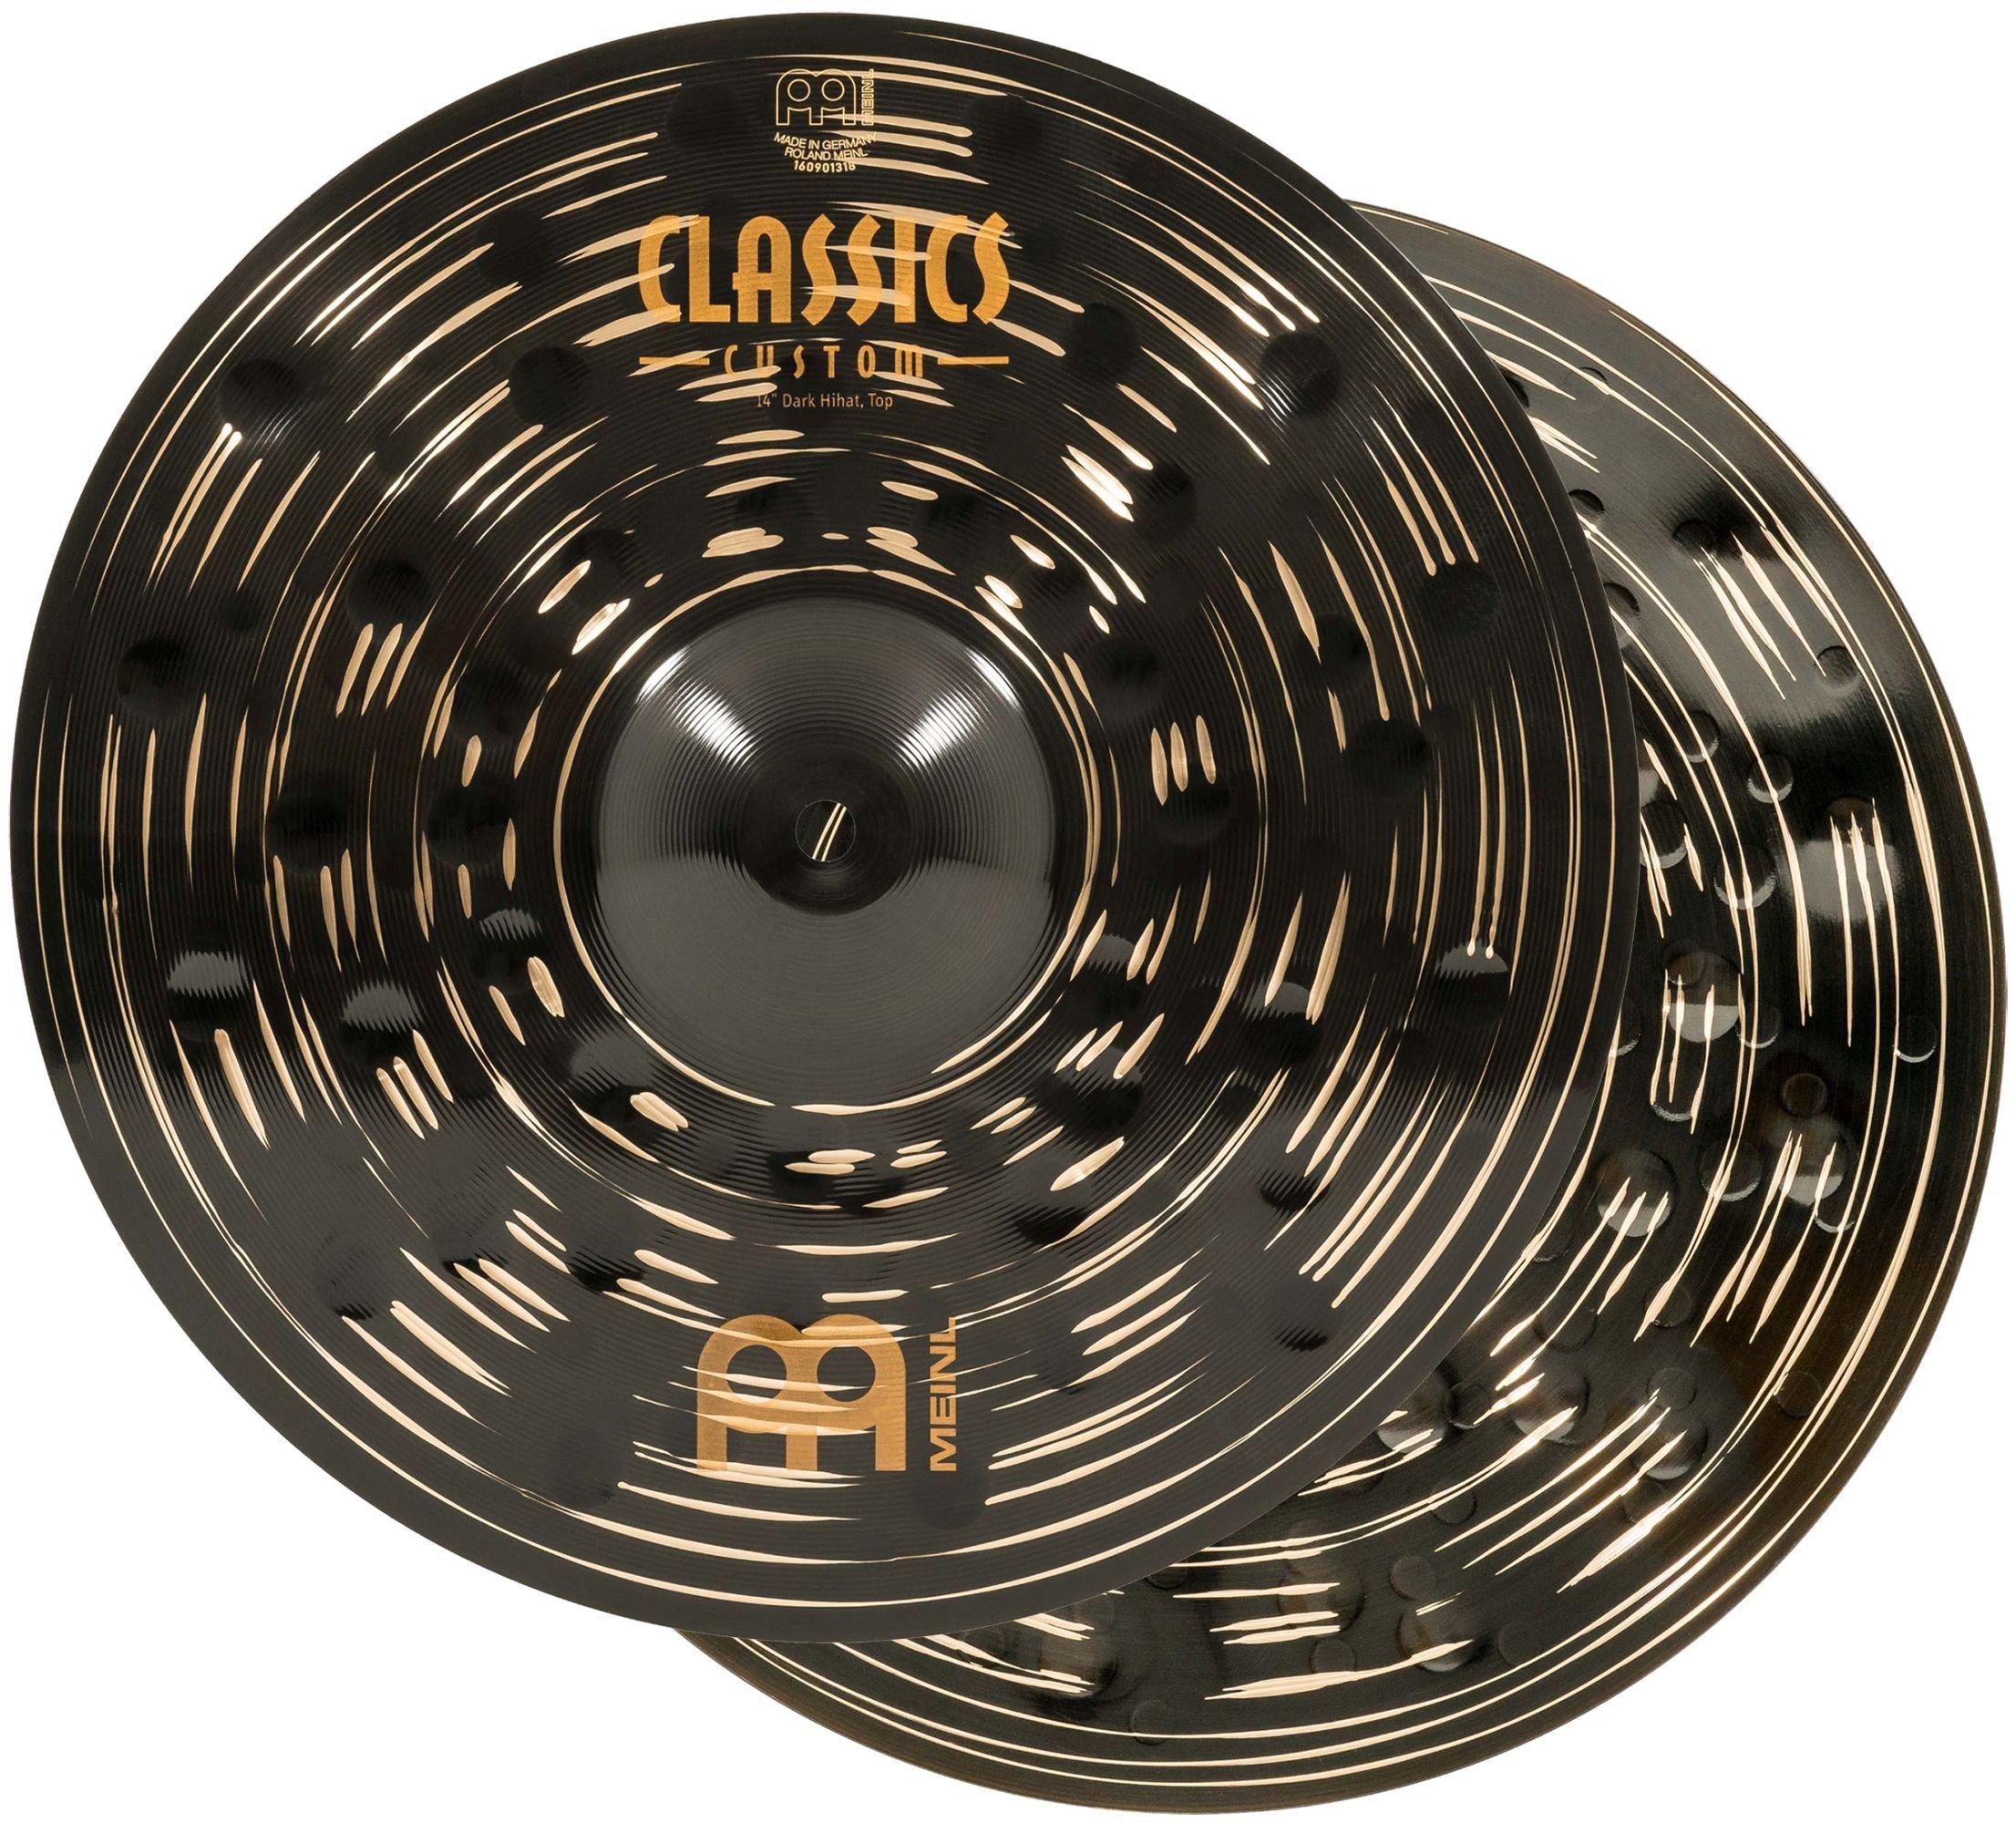 Meinl 14'' Hihat (Hi Hat) Cymbal Pair - Classics Custom Dark - Made in Germany, 2-YEAR WARRANTY (CC14DAH) by Meinl Cymbals